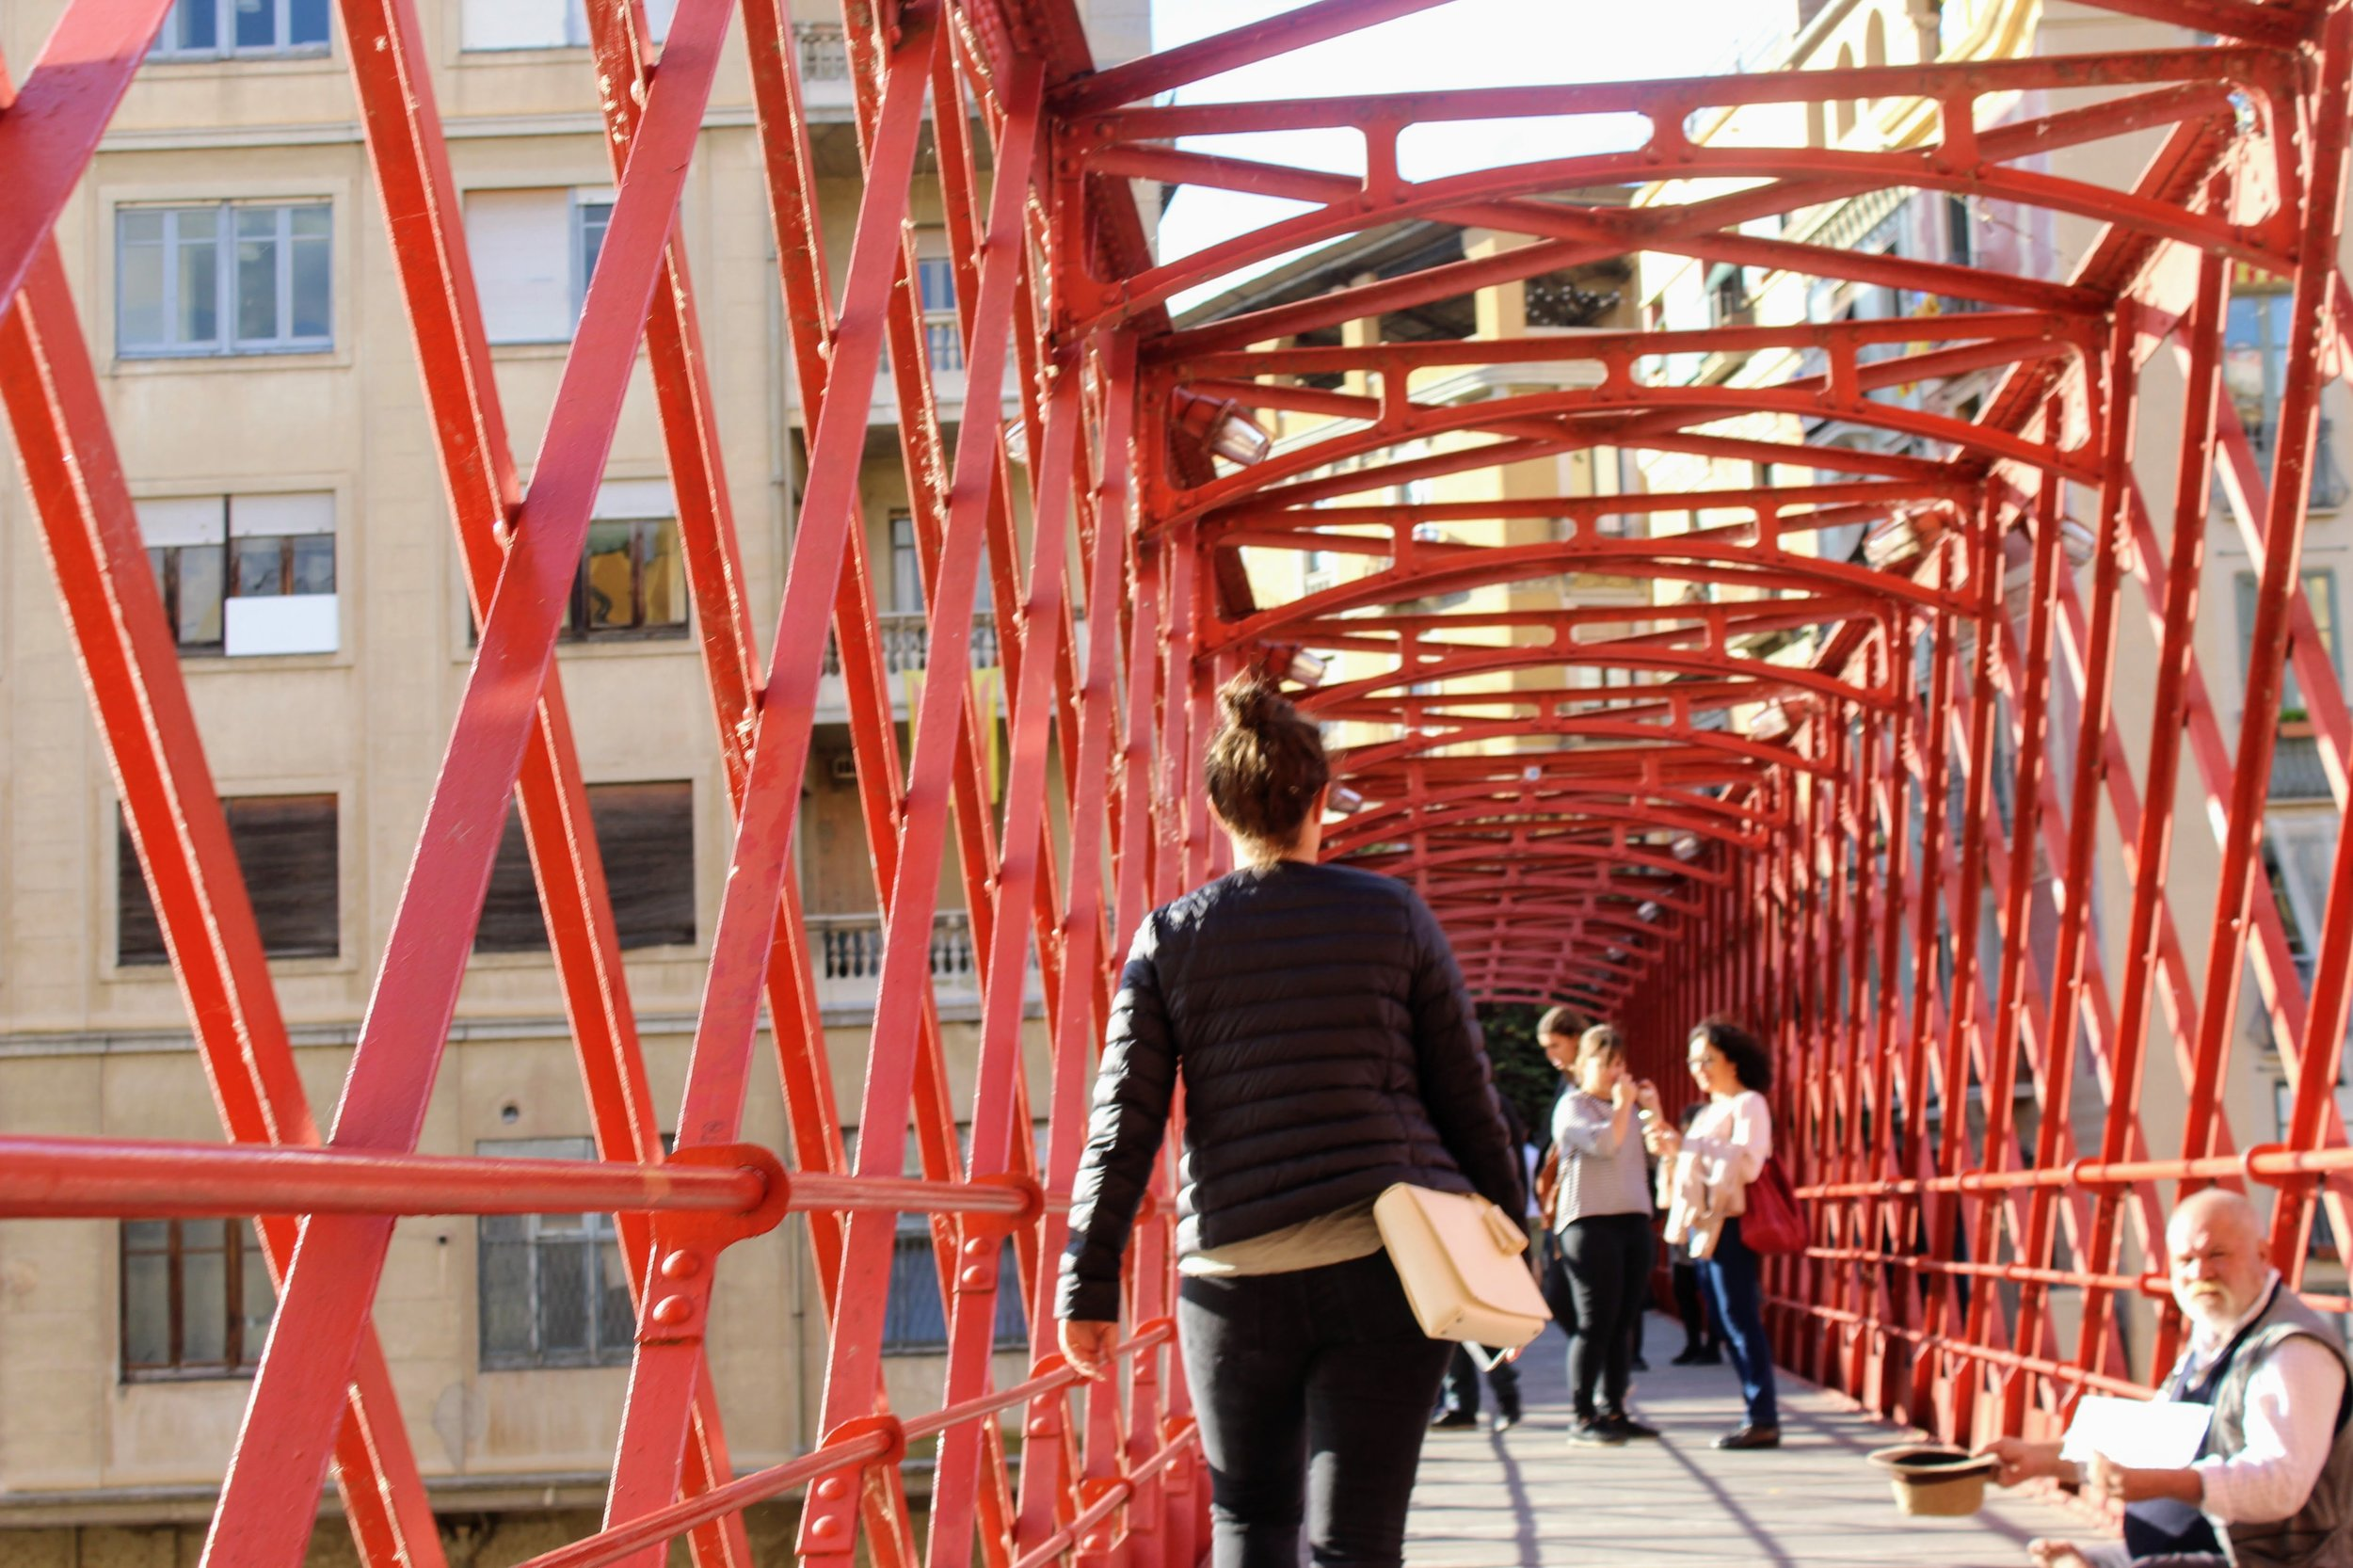 girona, spain, spain travel, travel to spain, day trip from barcelona, eiffel bridge